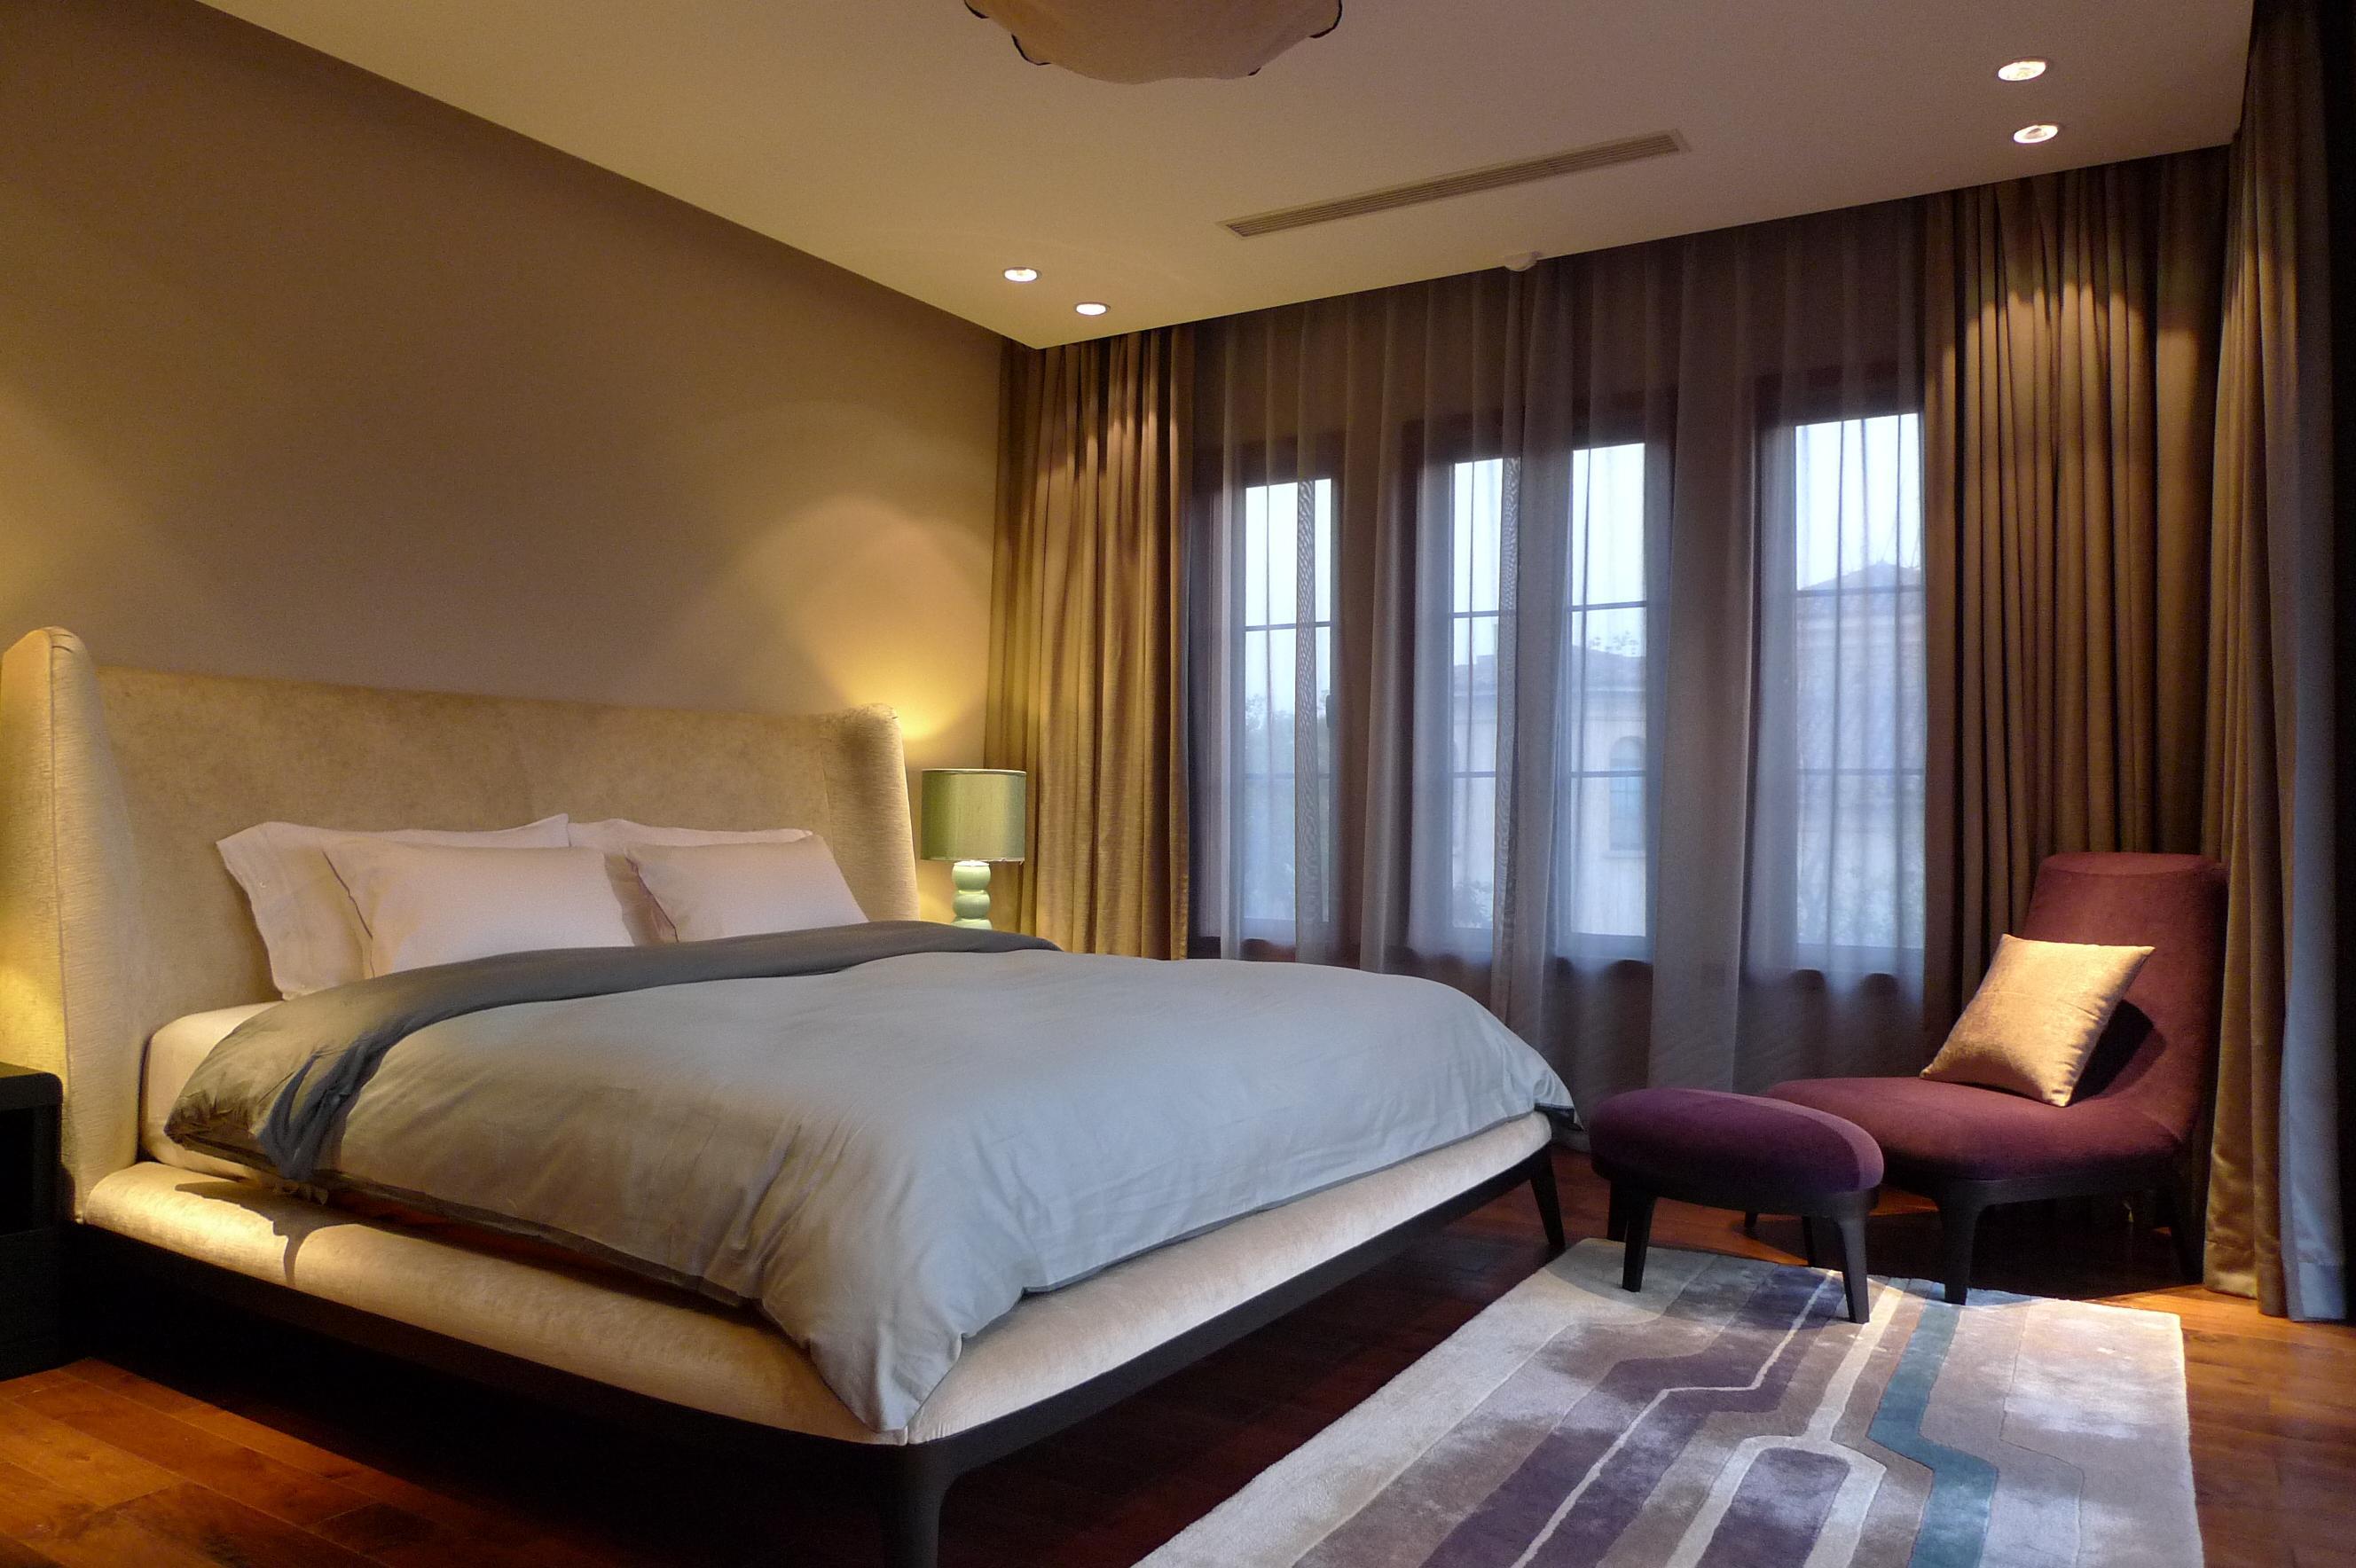 Schlafzimmer #bett #teppich #sessel #tagesdecke #kis...